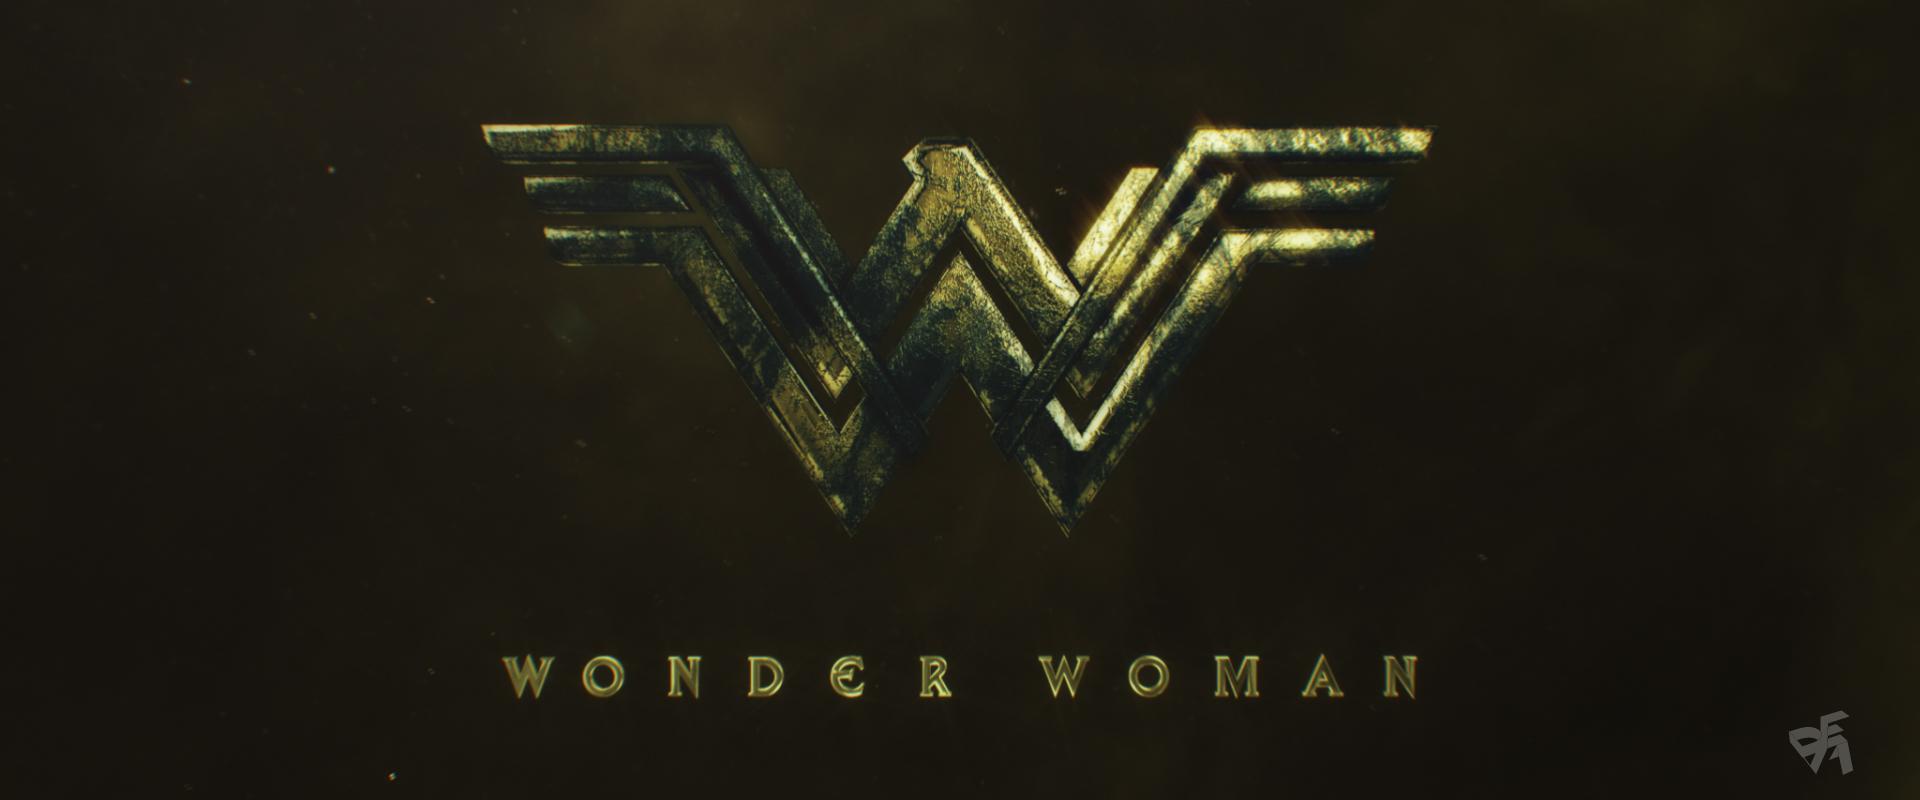 WonderWoman_STYLEFRAME_01.jpg